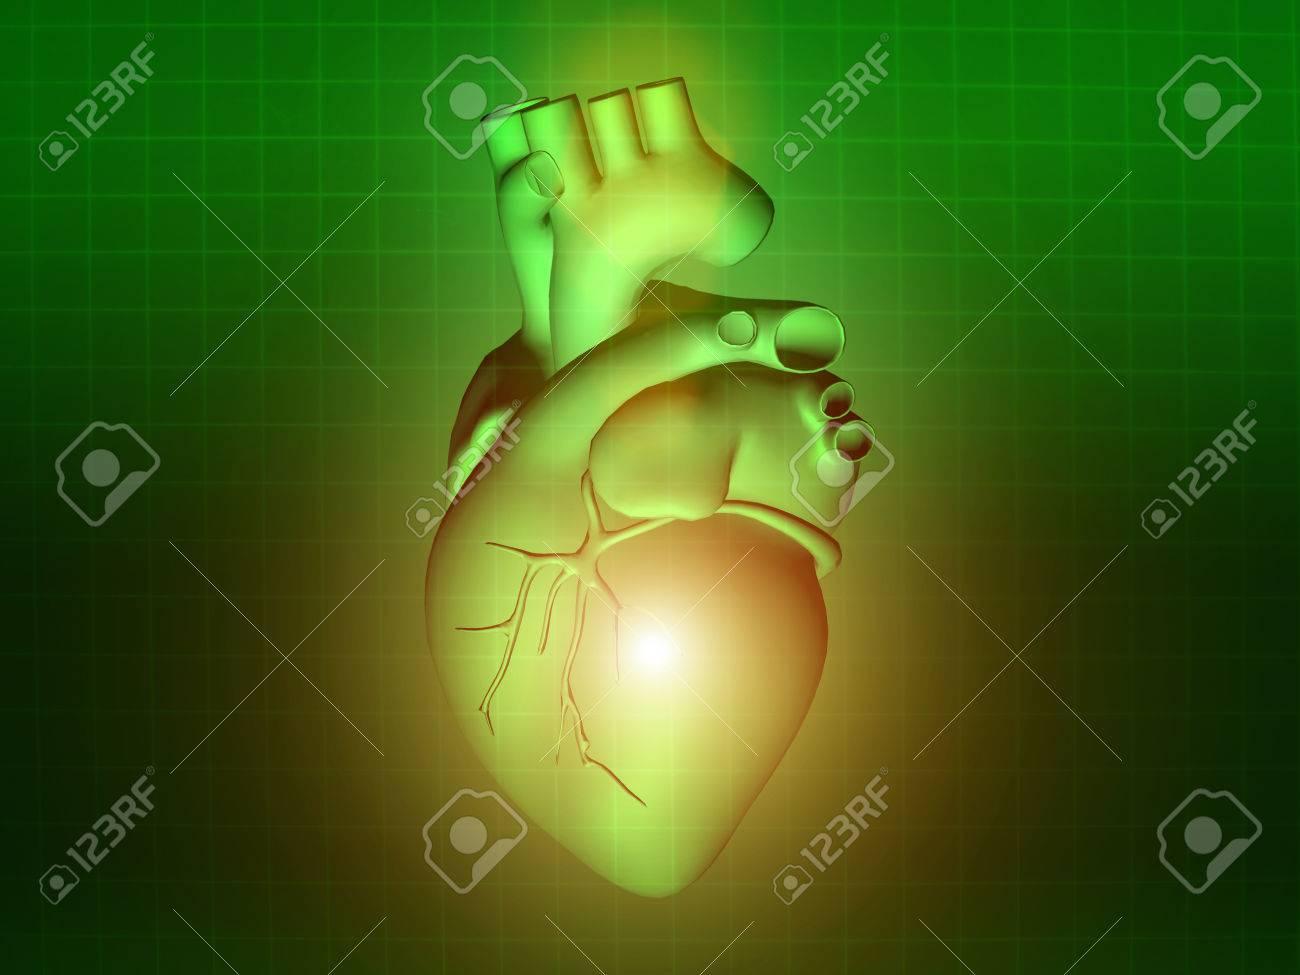 Heart Disease 3d Anatomy Illustration Health Green Stock Photo ...